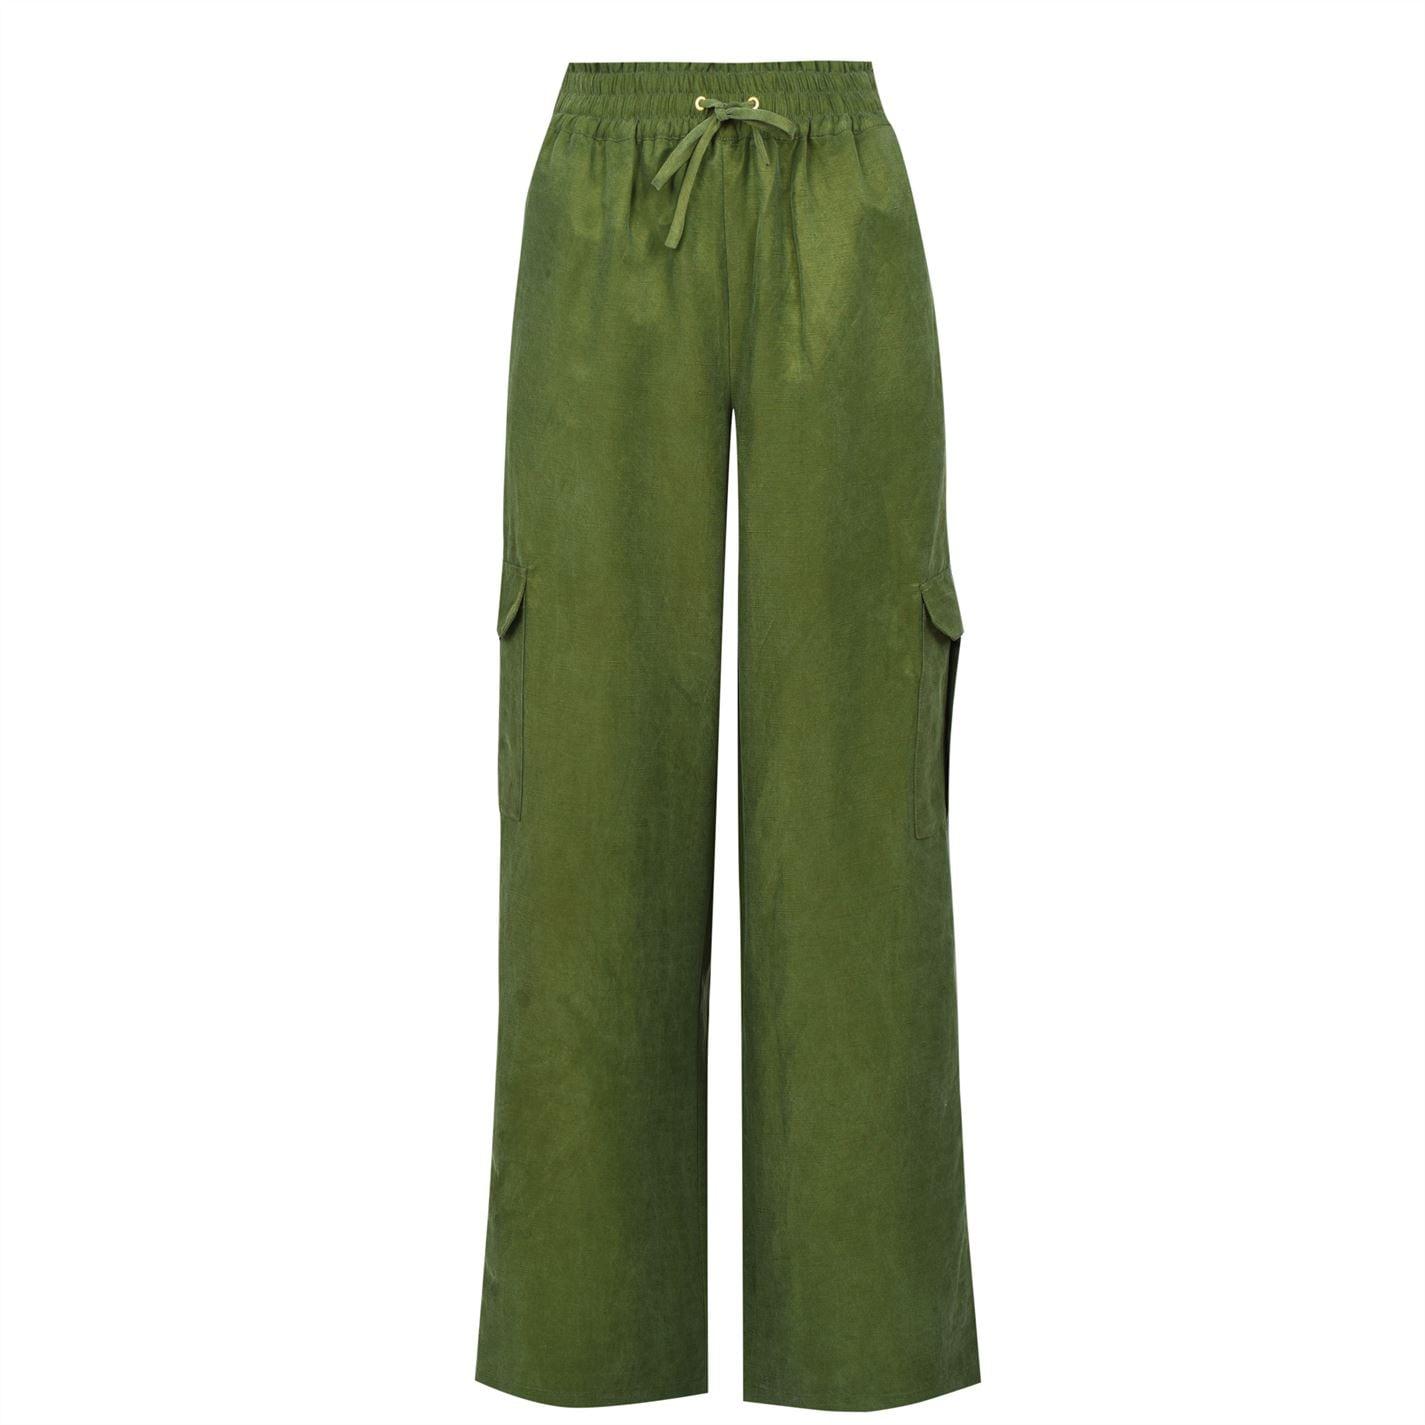 Mergi la Pantaloni Scotch and Soda Linen Blend Cargo kaki